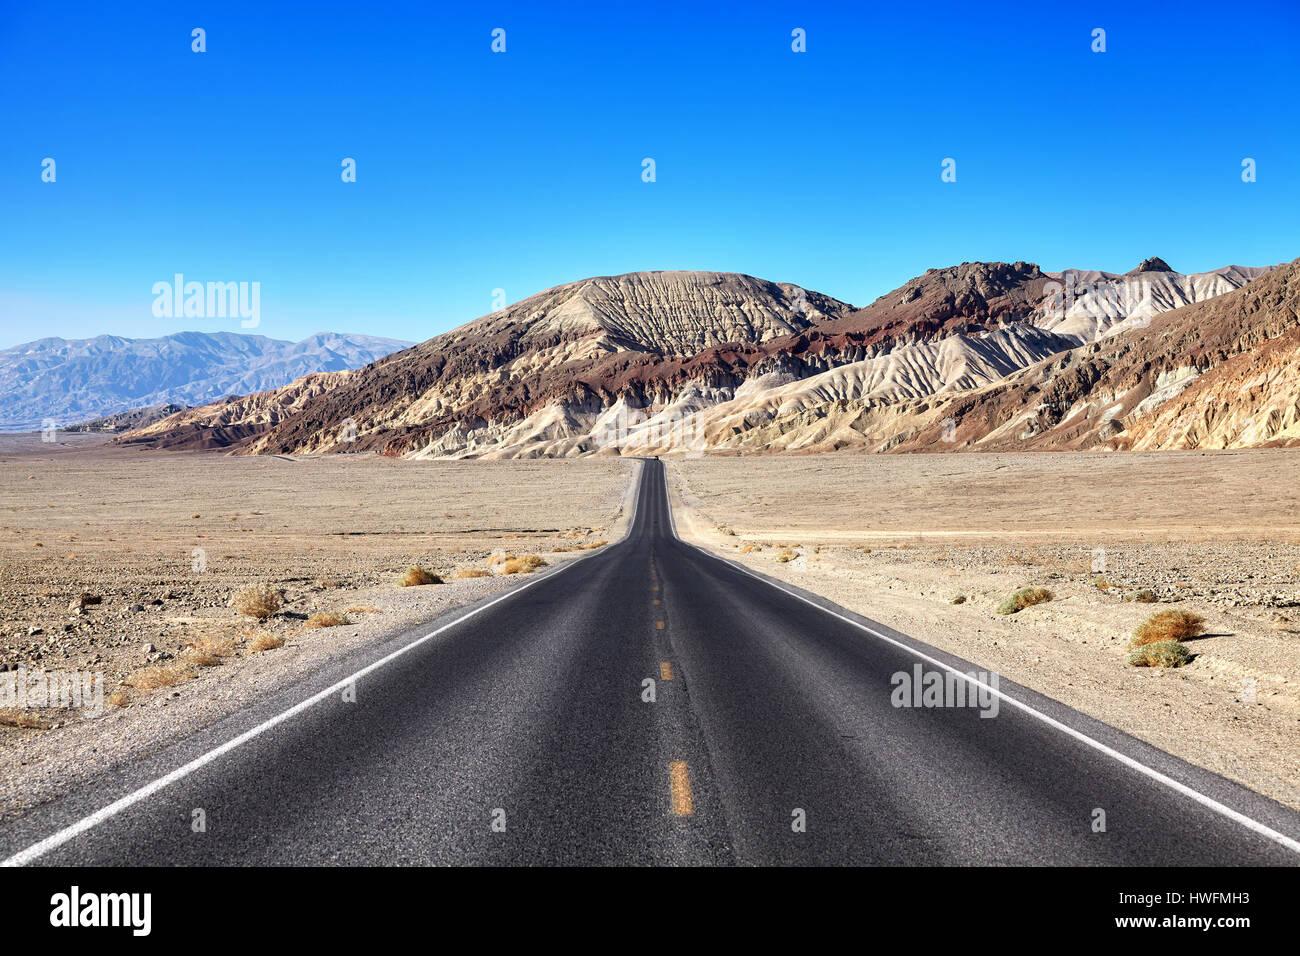 Desert road towards mountain range at Death Valley, travel concept, focus on mountains, USA. - Stock Image